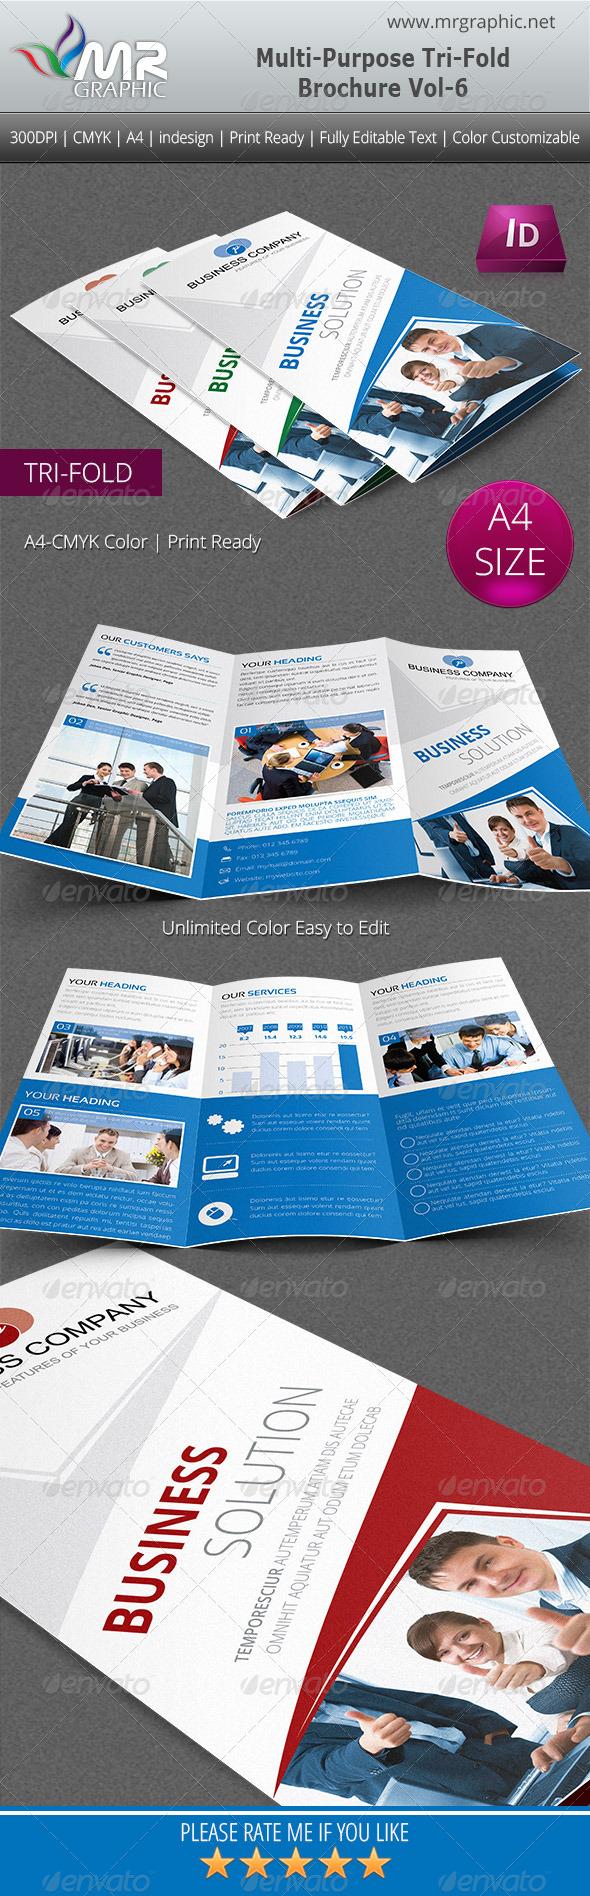 Multipurpose Business Tri-Fold Brochure Vol-6 - Corporate Brochures